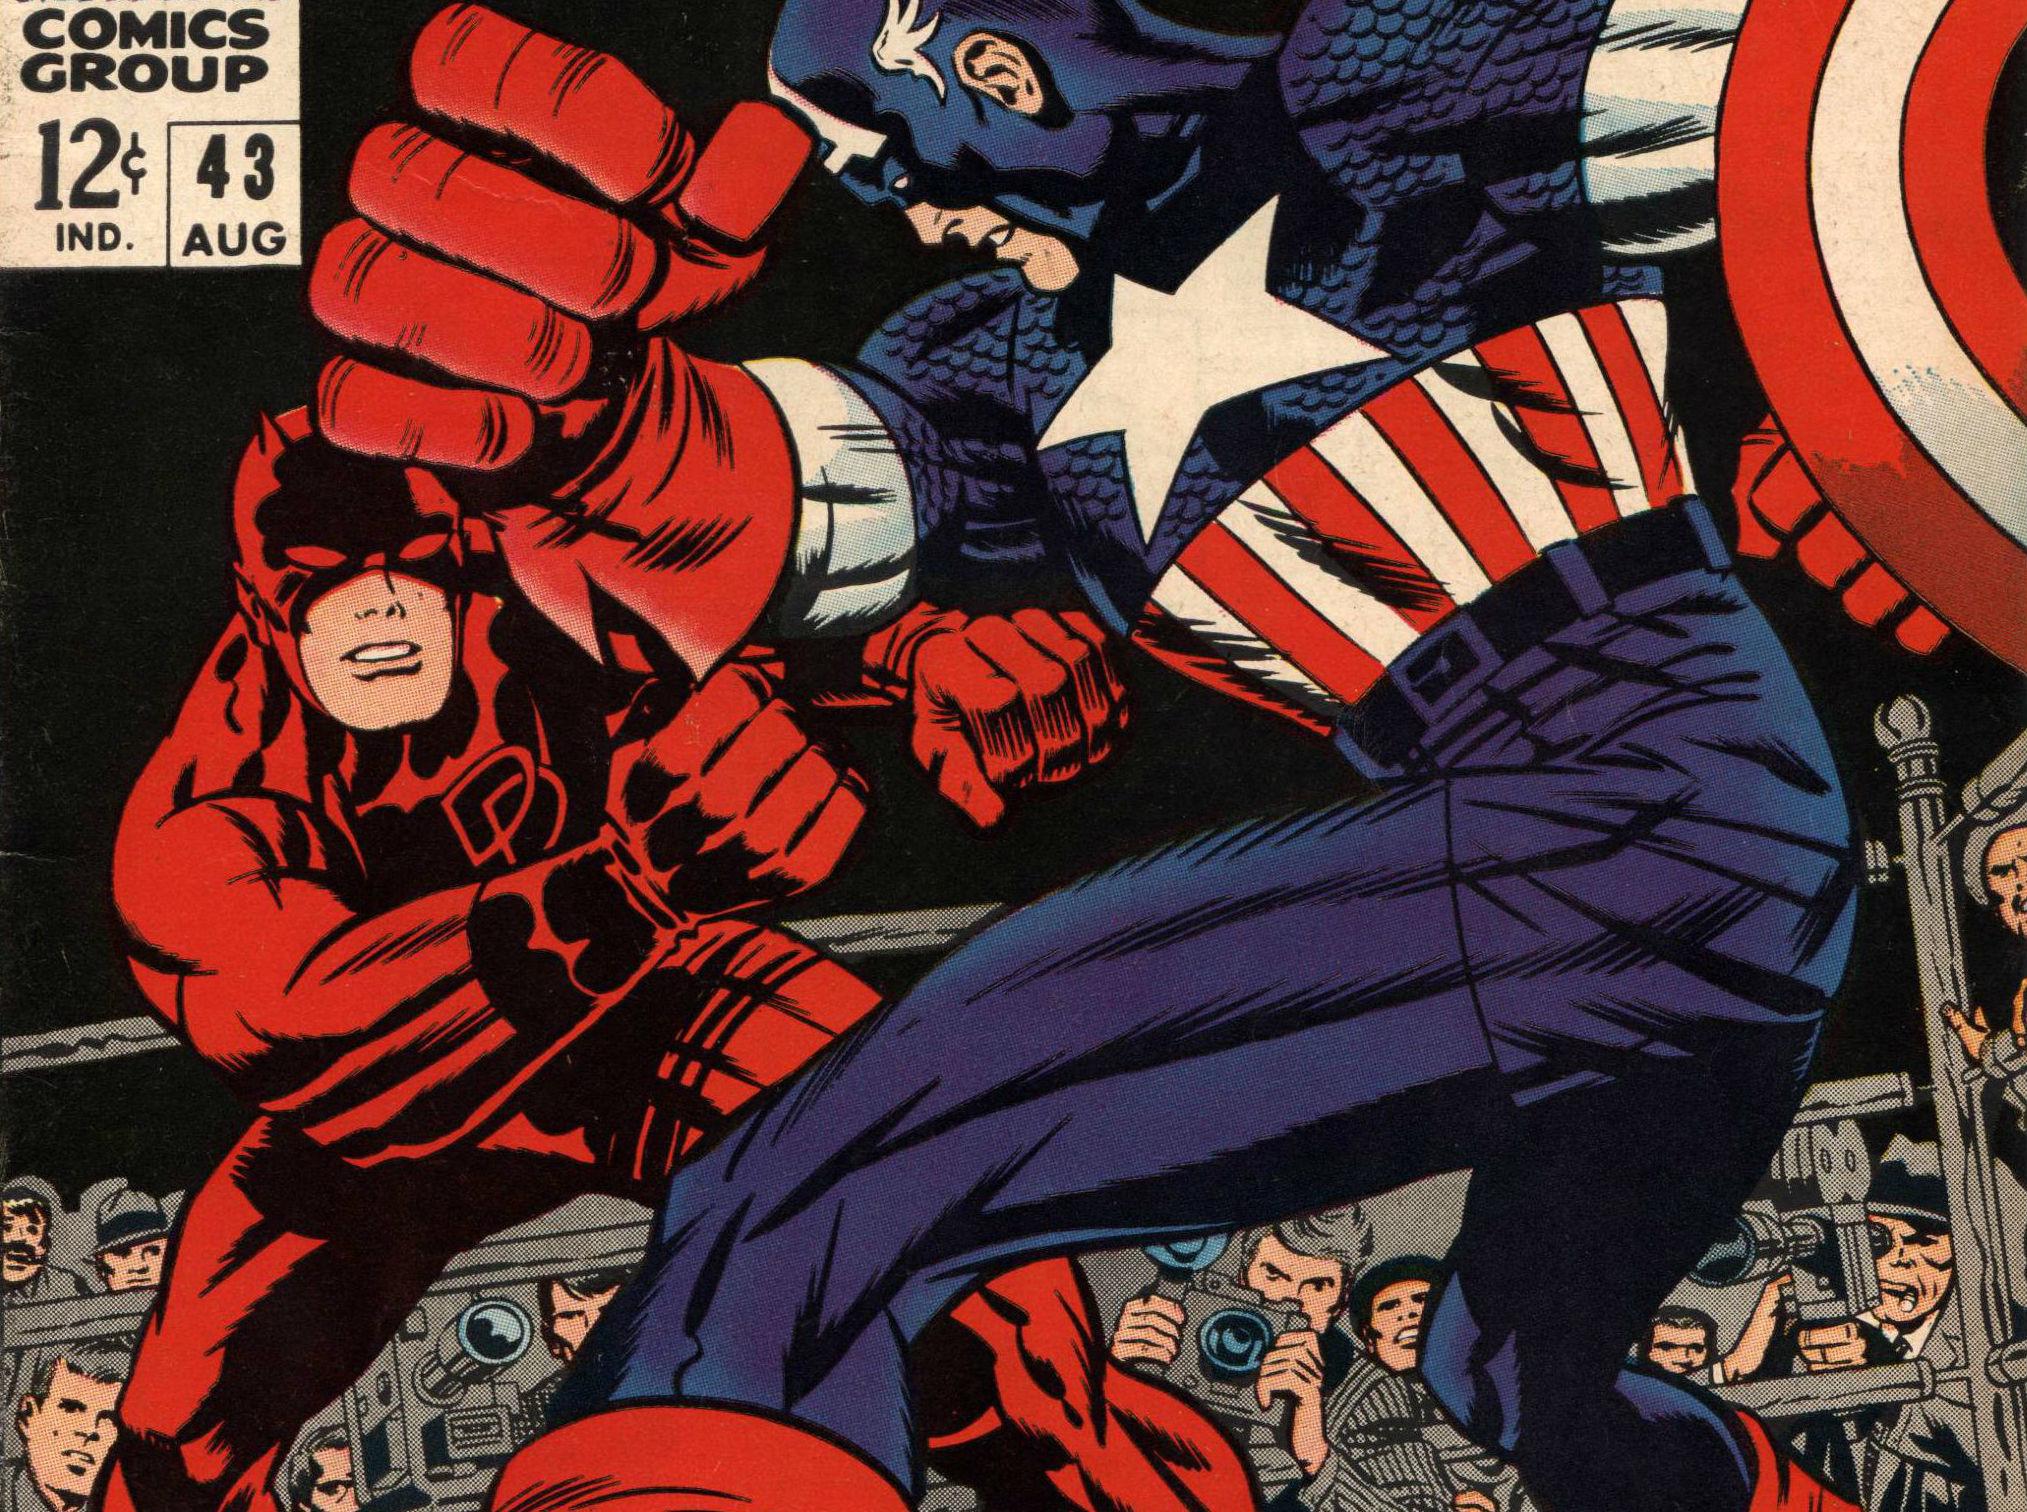 Res: 2027x1512, DAREDEVIL marvel superhero captain america fs wallpaper |  |  138235 | WallpaperUP